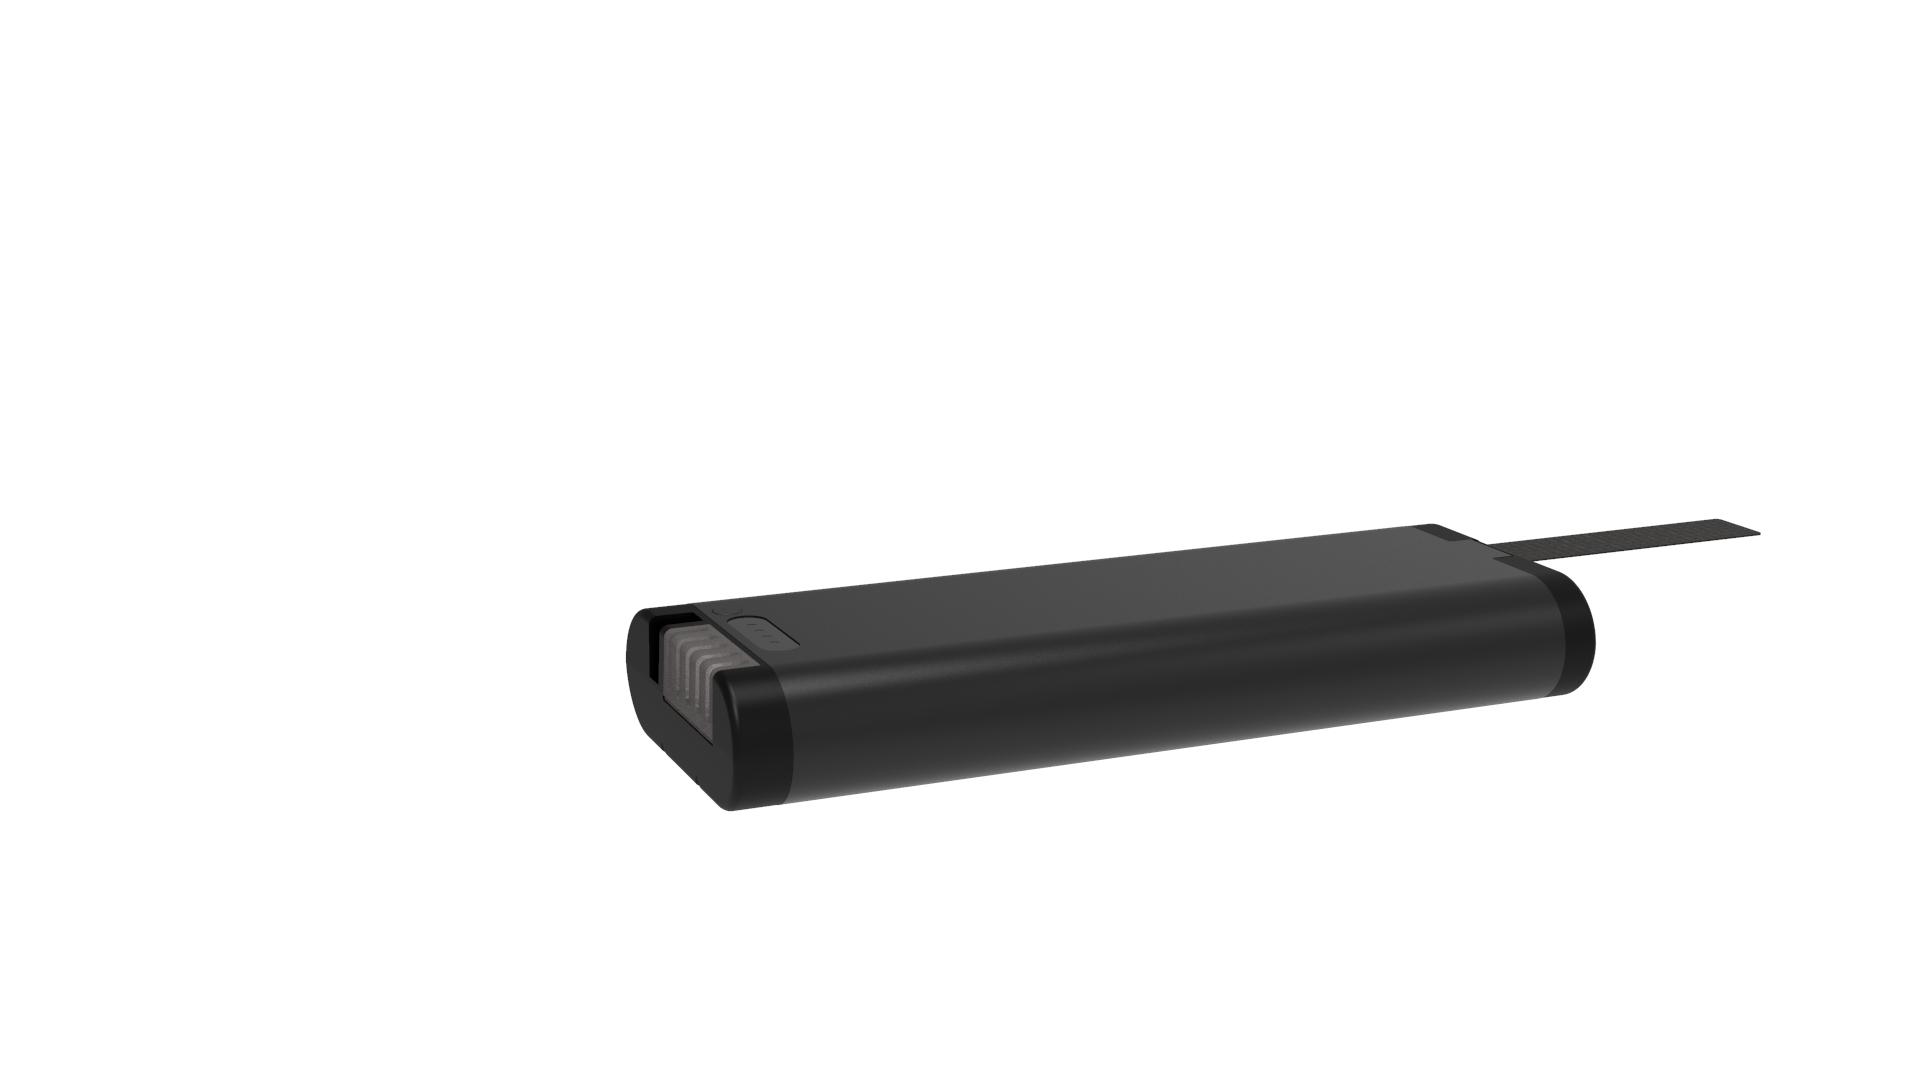 Newly designed 11.1V 7000mAh lithium battery pack